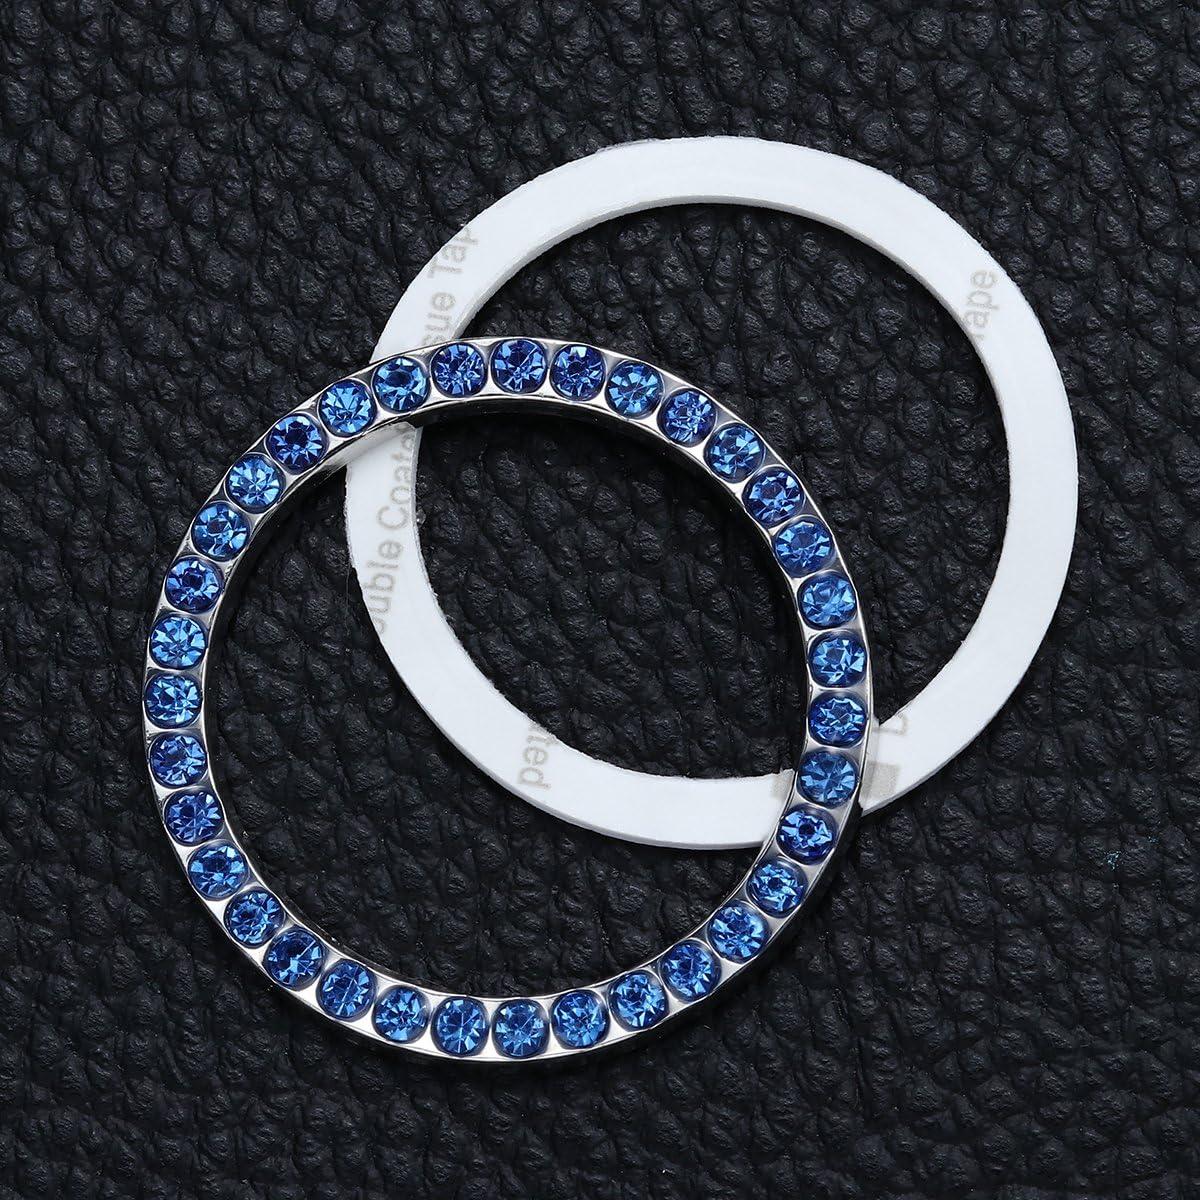 WINOMO Auto Engine Start Stop Button Ring Crystal Bling Rhinestone Car Decor Accessories Blue